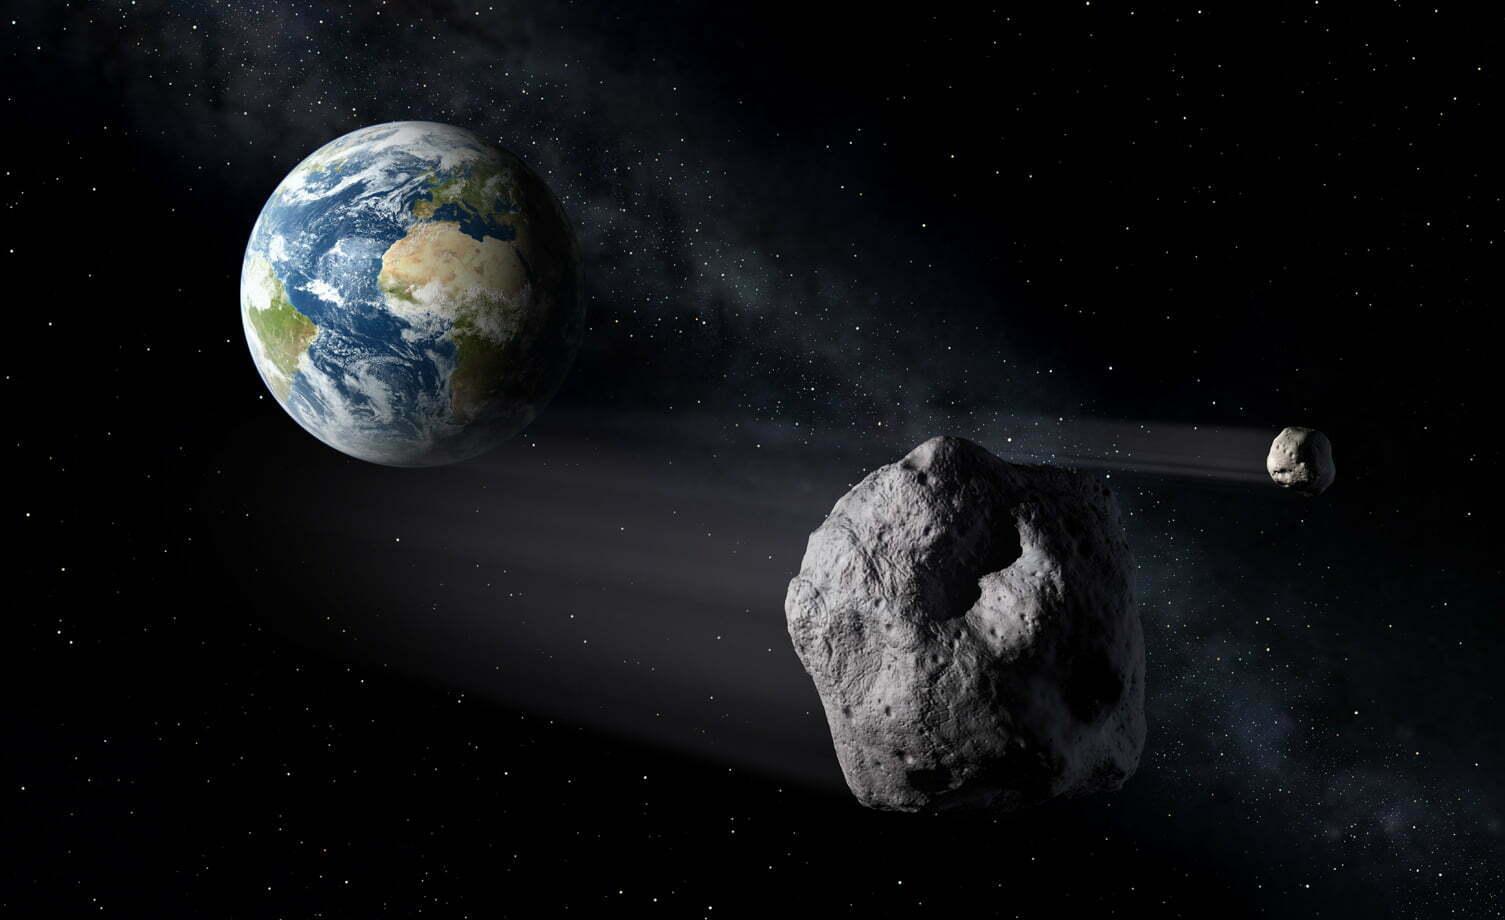 http://www.meteoweb.eu/wp-content/uploads/2012/02/Grande-asteroide-2040-terra.jpg